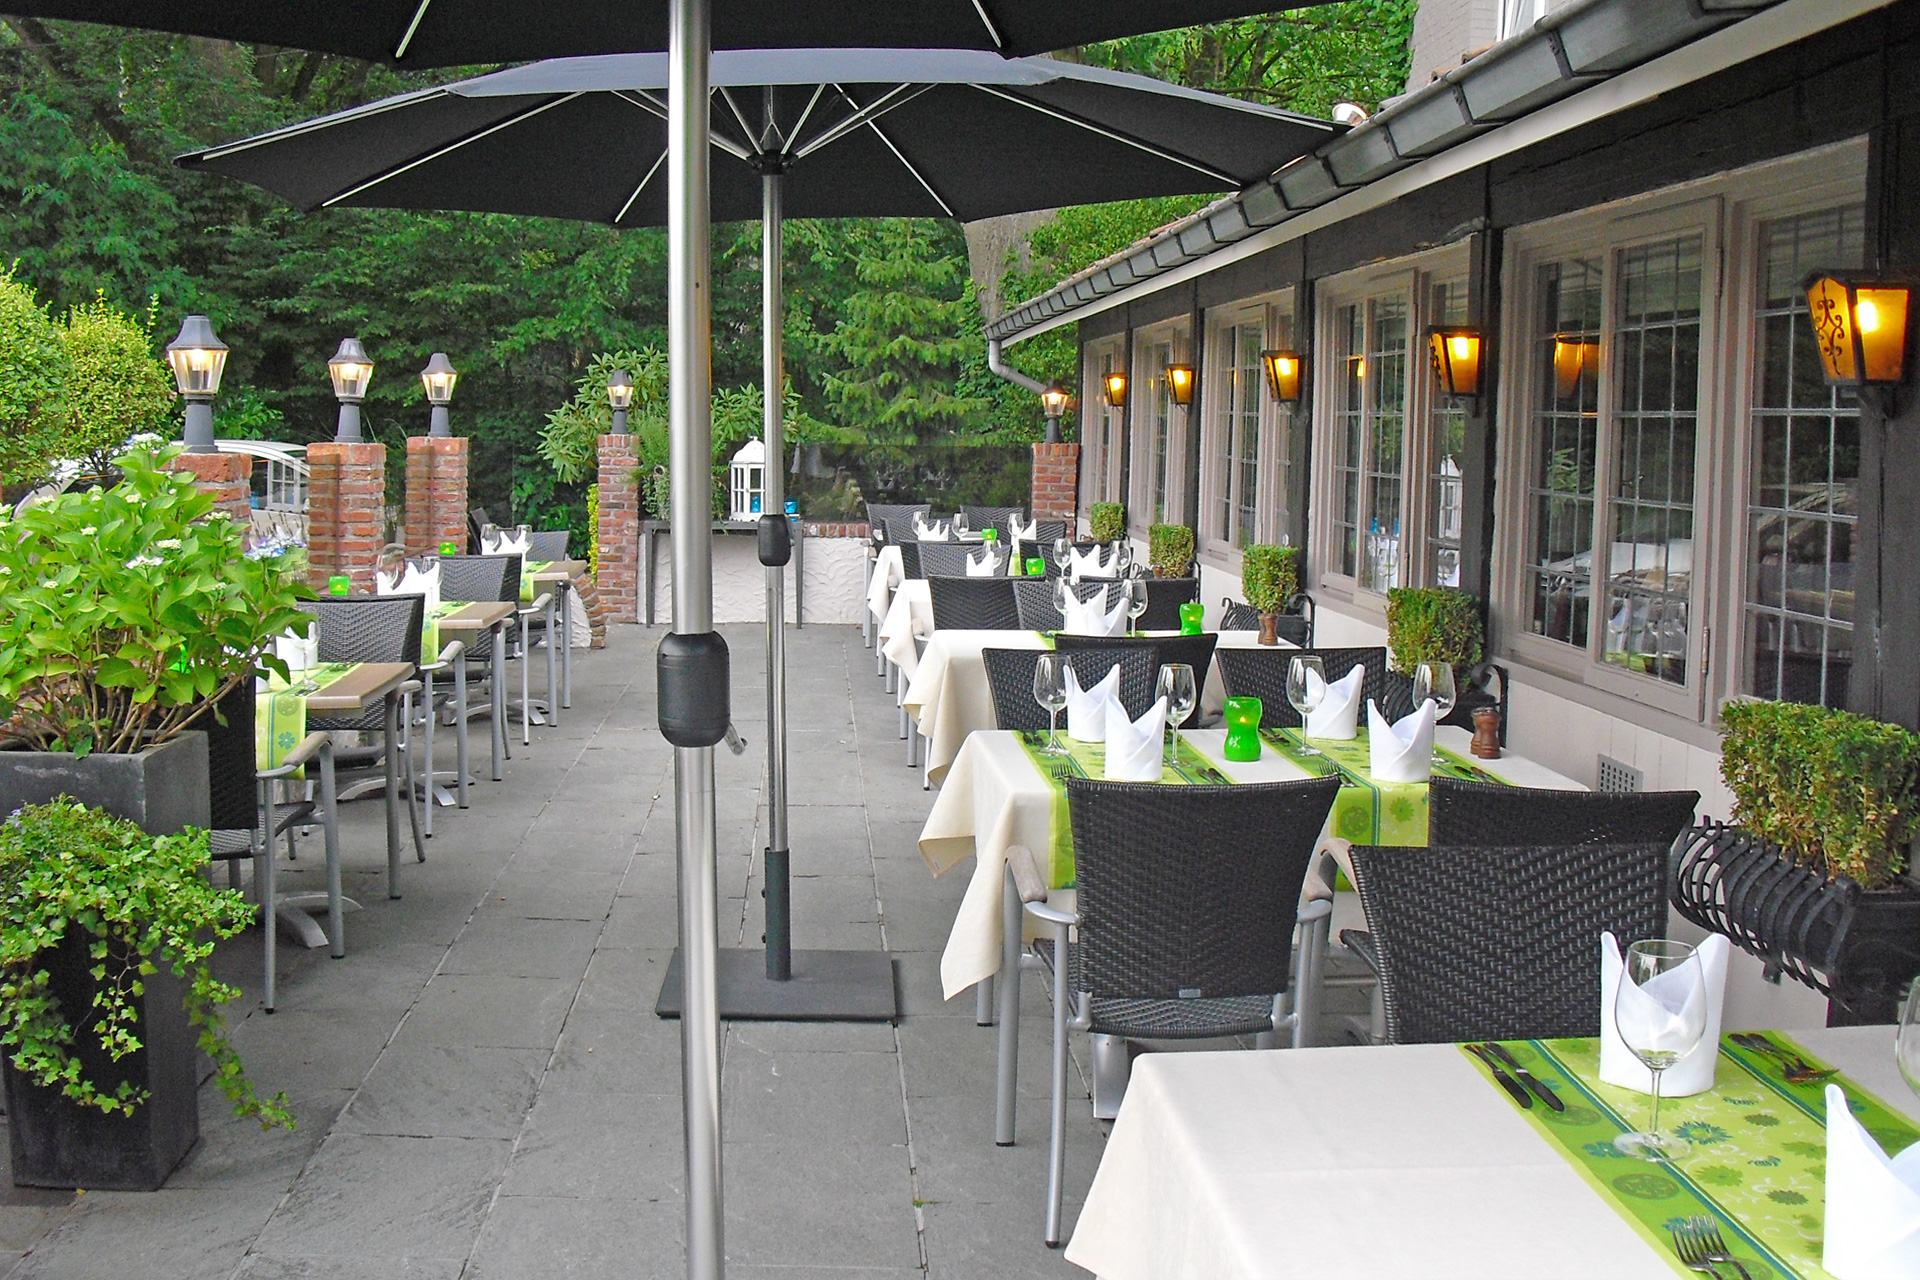 restaurant-malpertus-in-st-niklaas_CIMG145